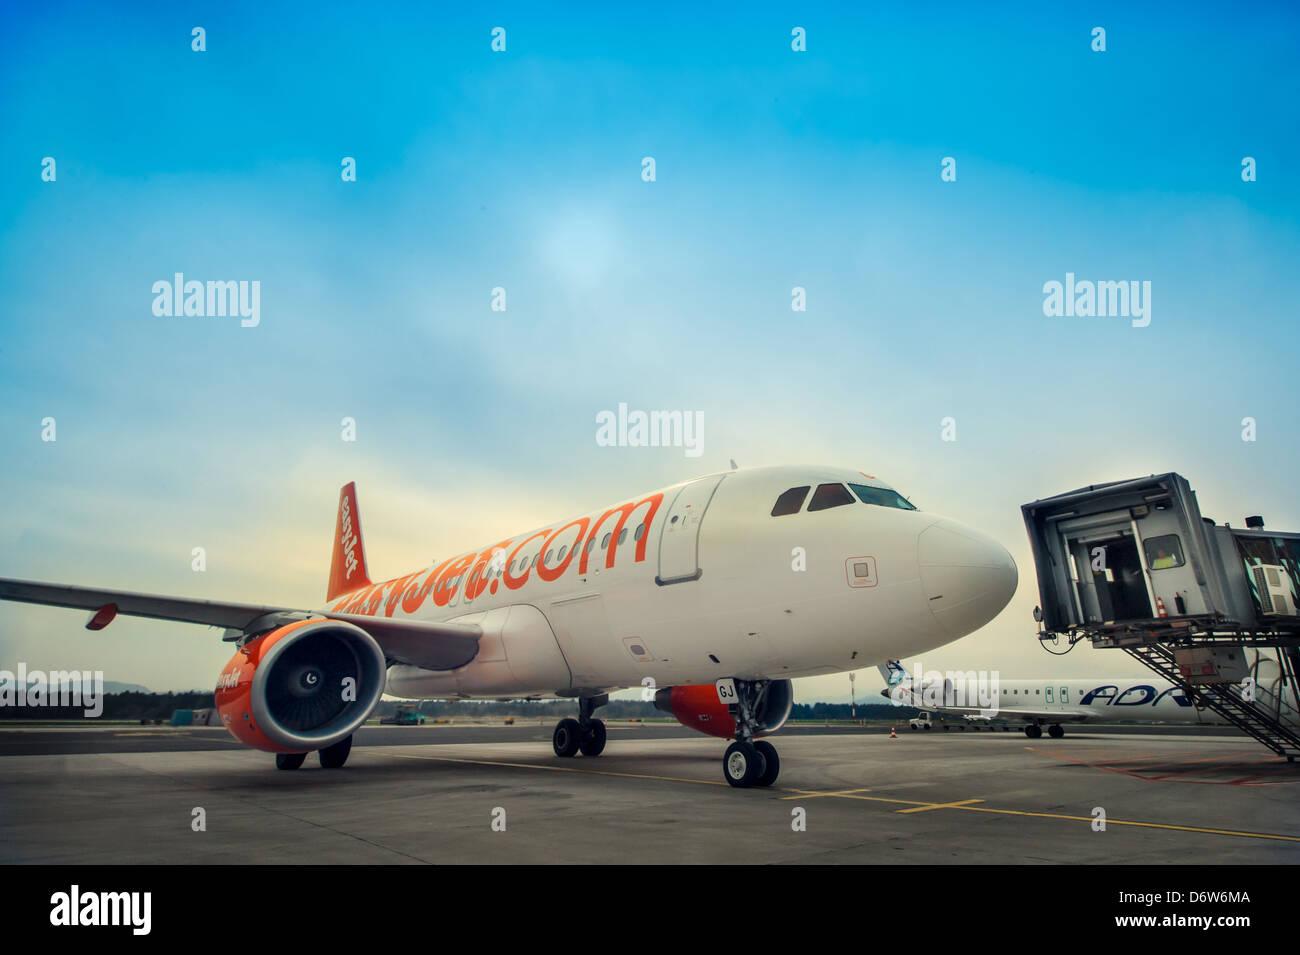 Easyjet plane arrives at Ljubljana Airport on April 20, 2013 - Stock Image